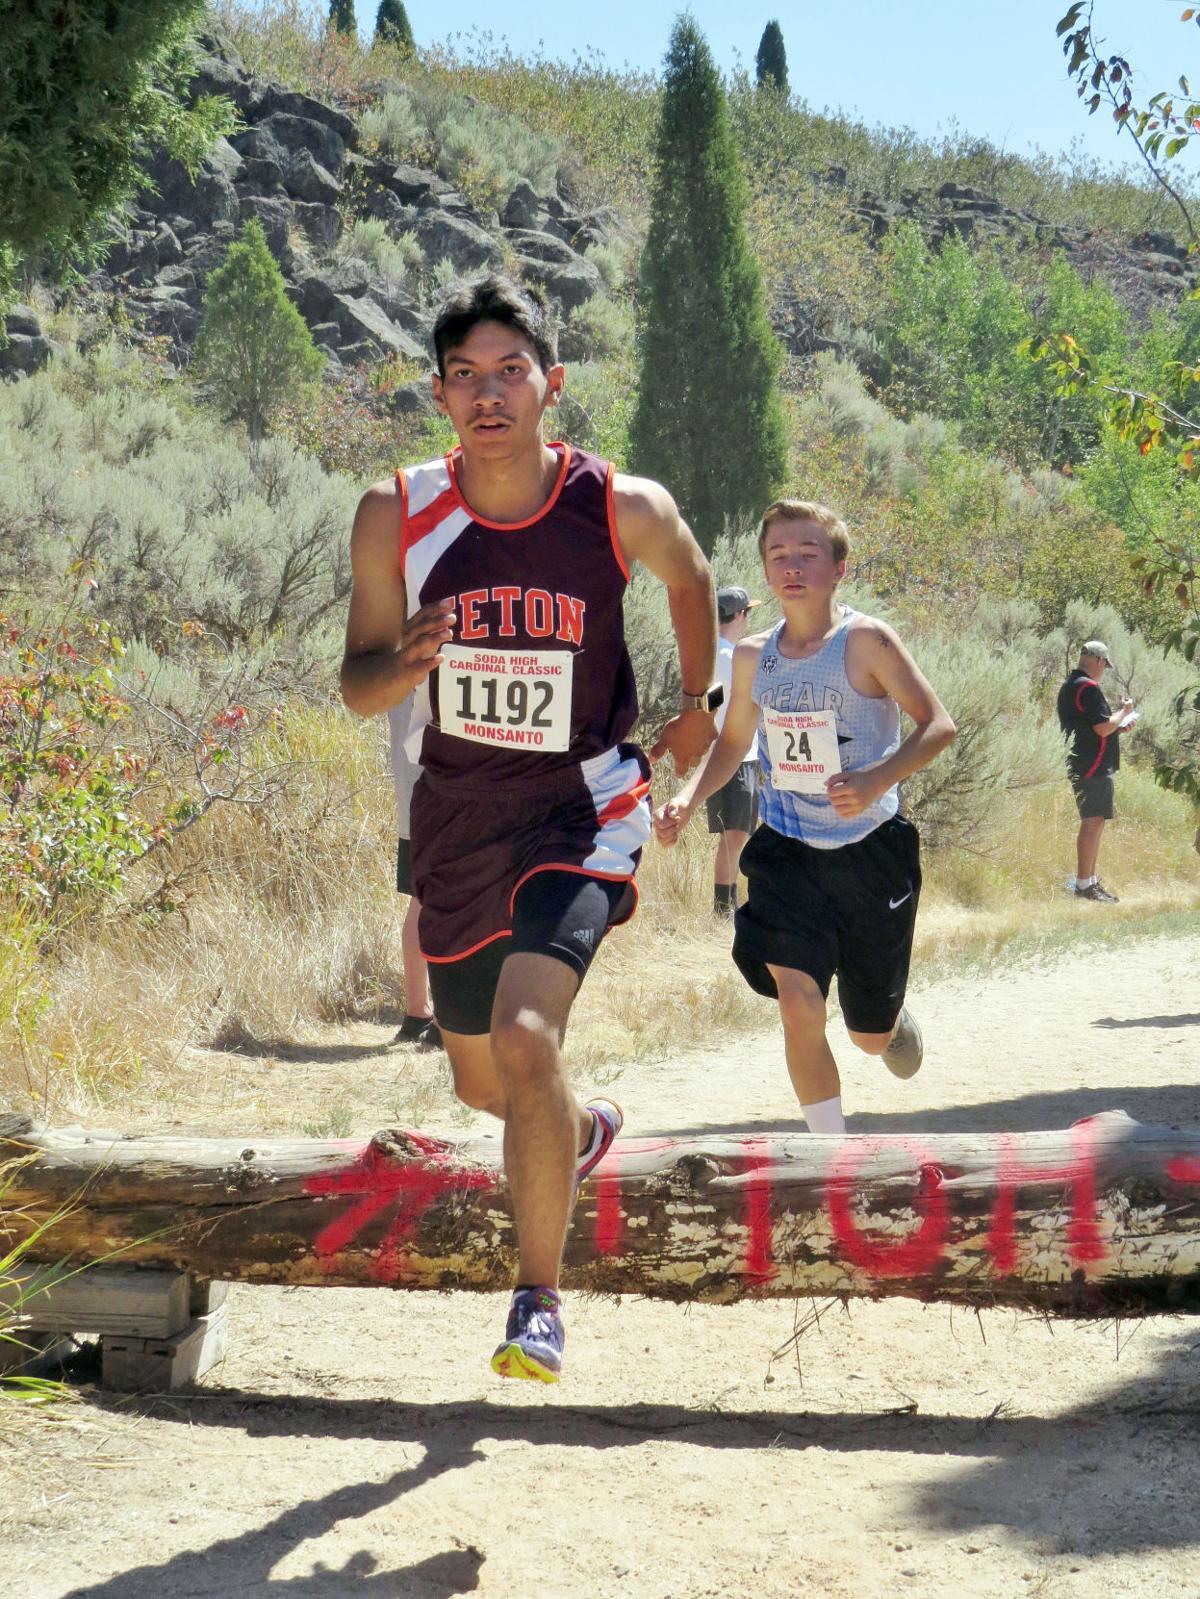 Teton stretches its legs at Cardinal Classic